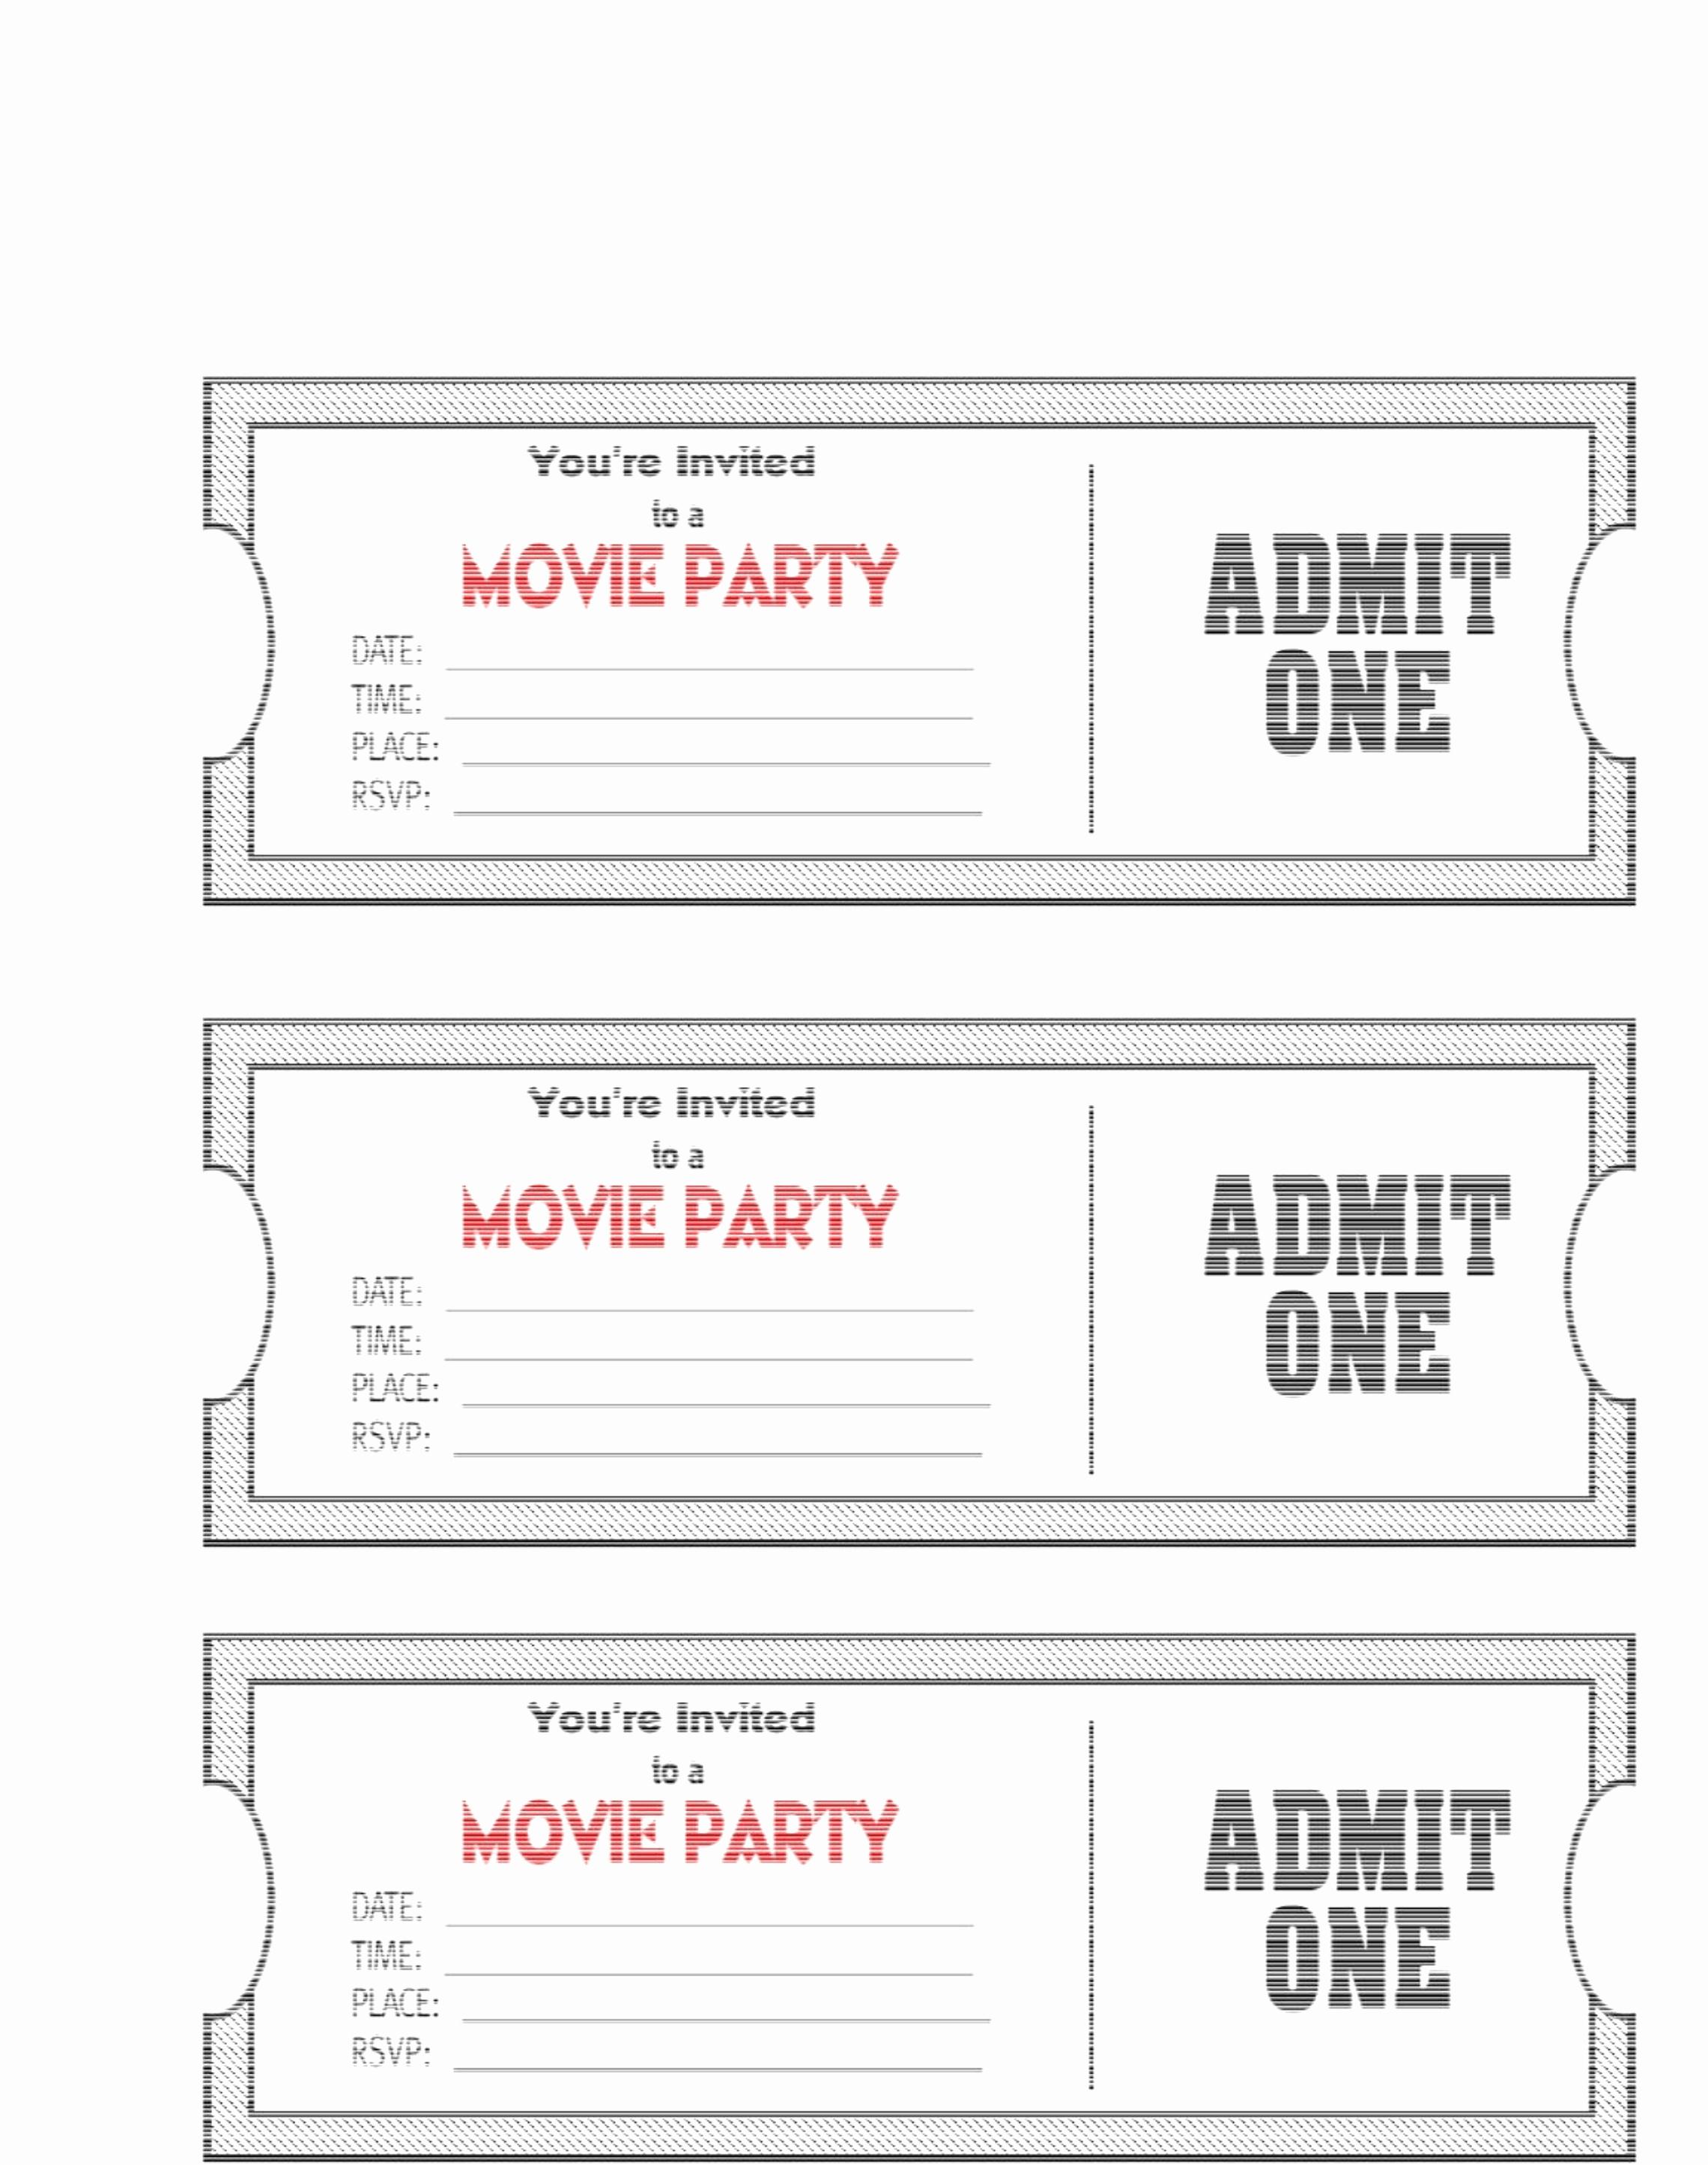 Admit One Ticket Template Printable Inspirational Free Printable Movie Ticket Invitations